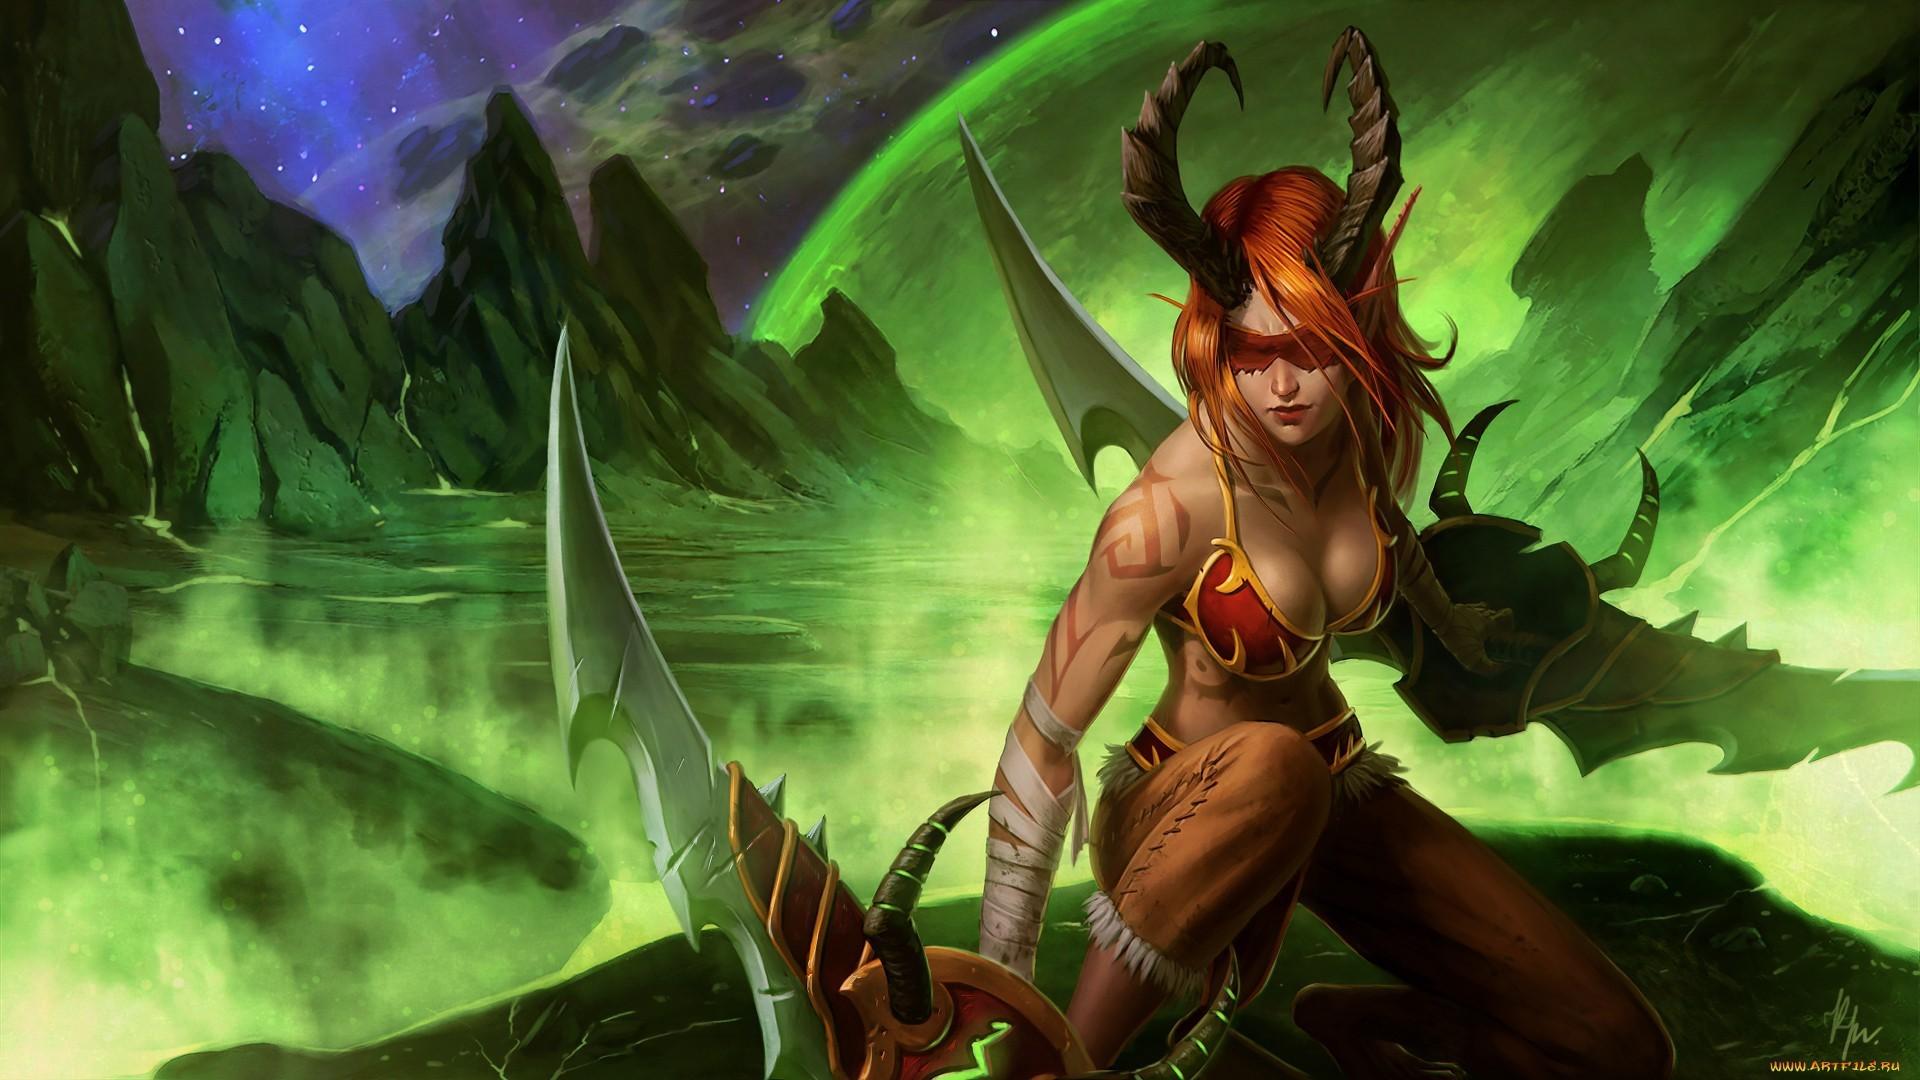 World of Warcraft images